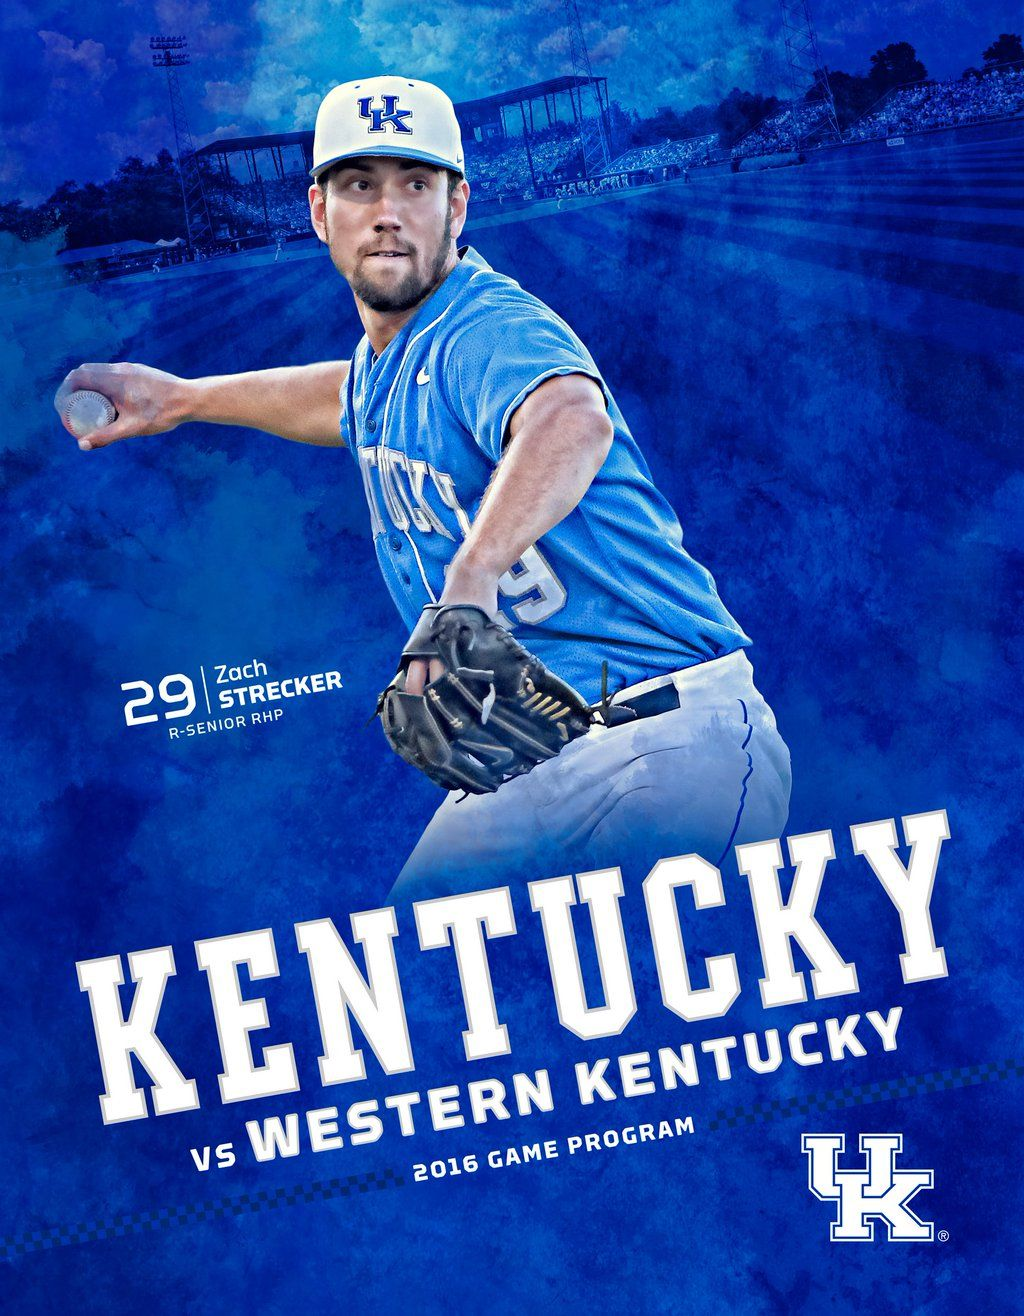 Image by Brandon Kolditz on Kentucky Athletics Graphics